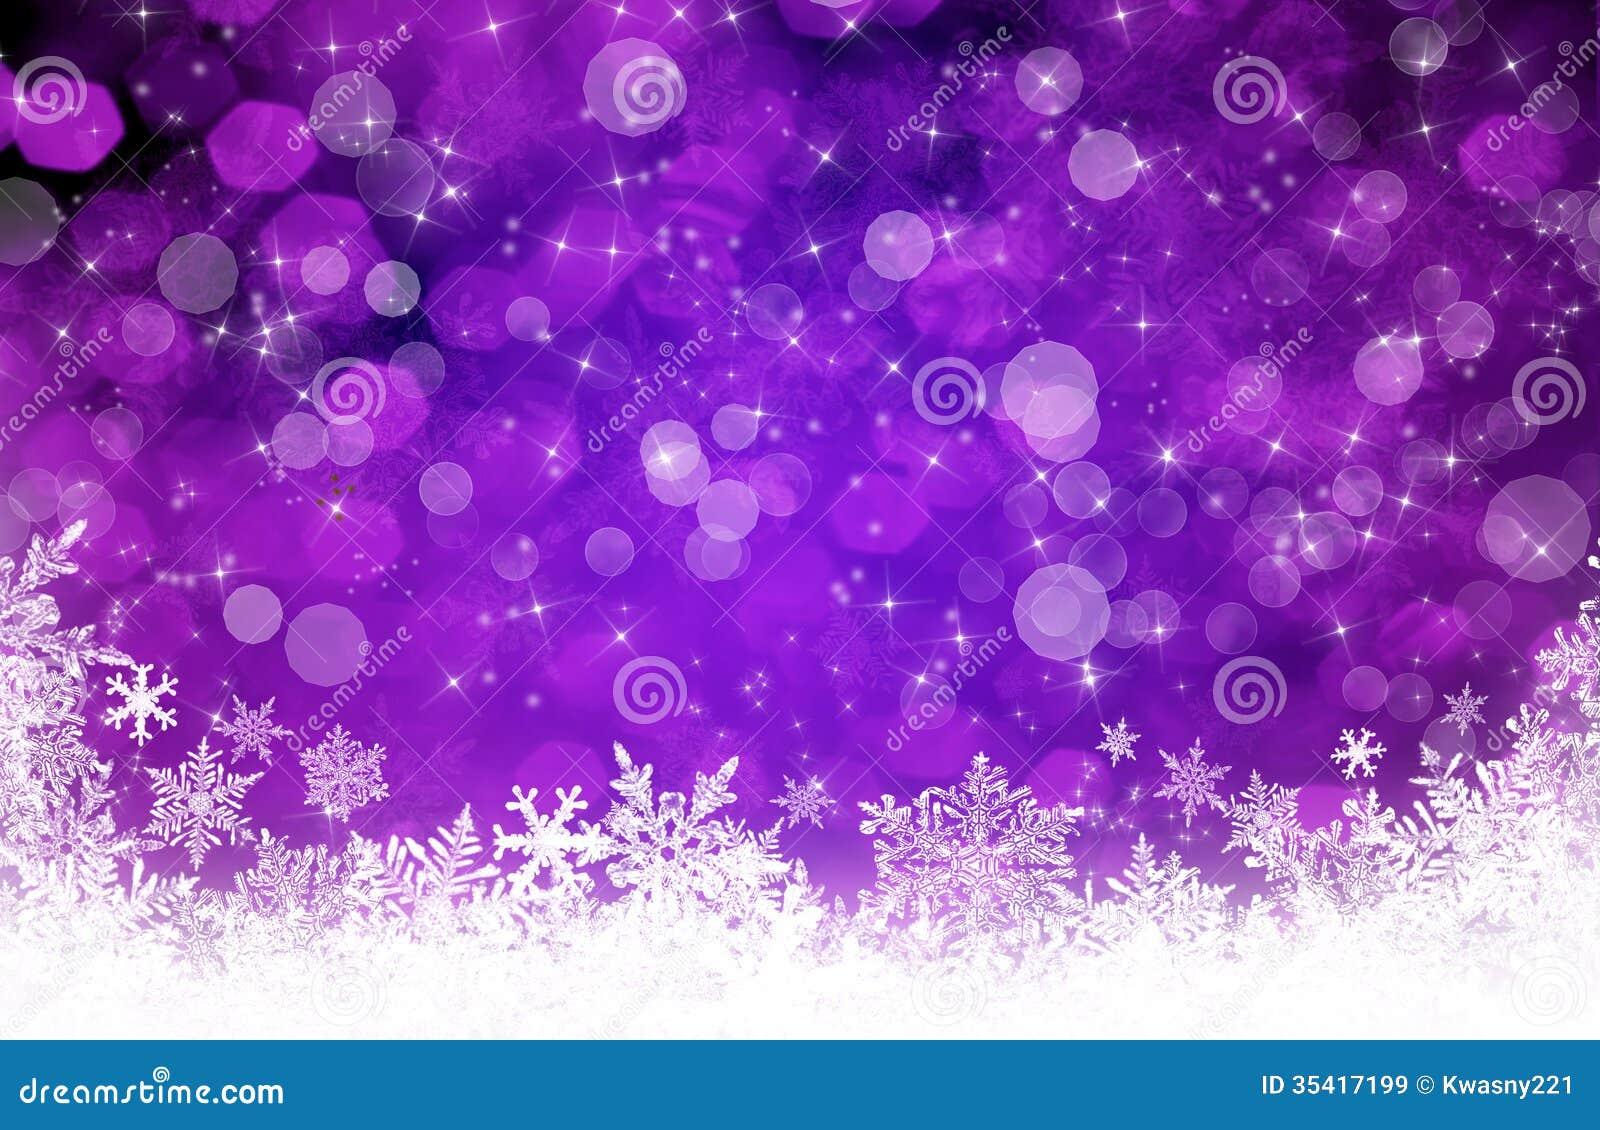 Christmas Background Royalty Free Stock Images - Image: 35417199